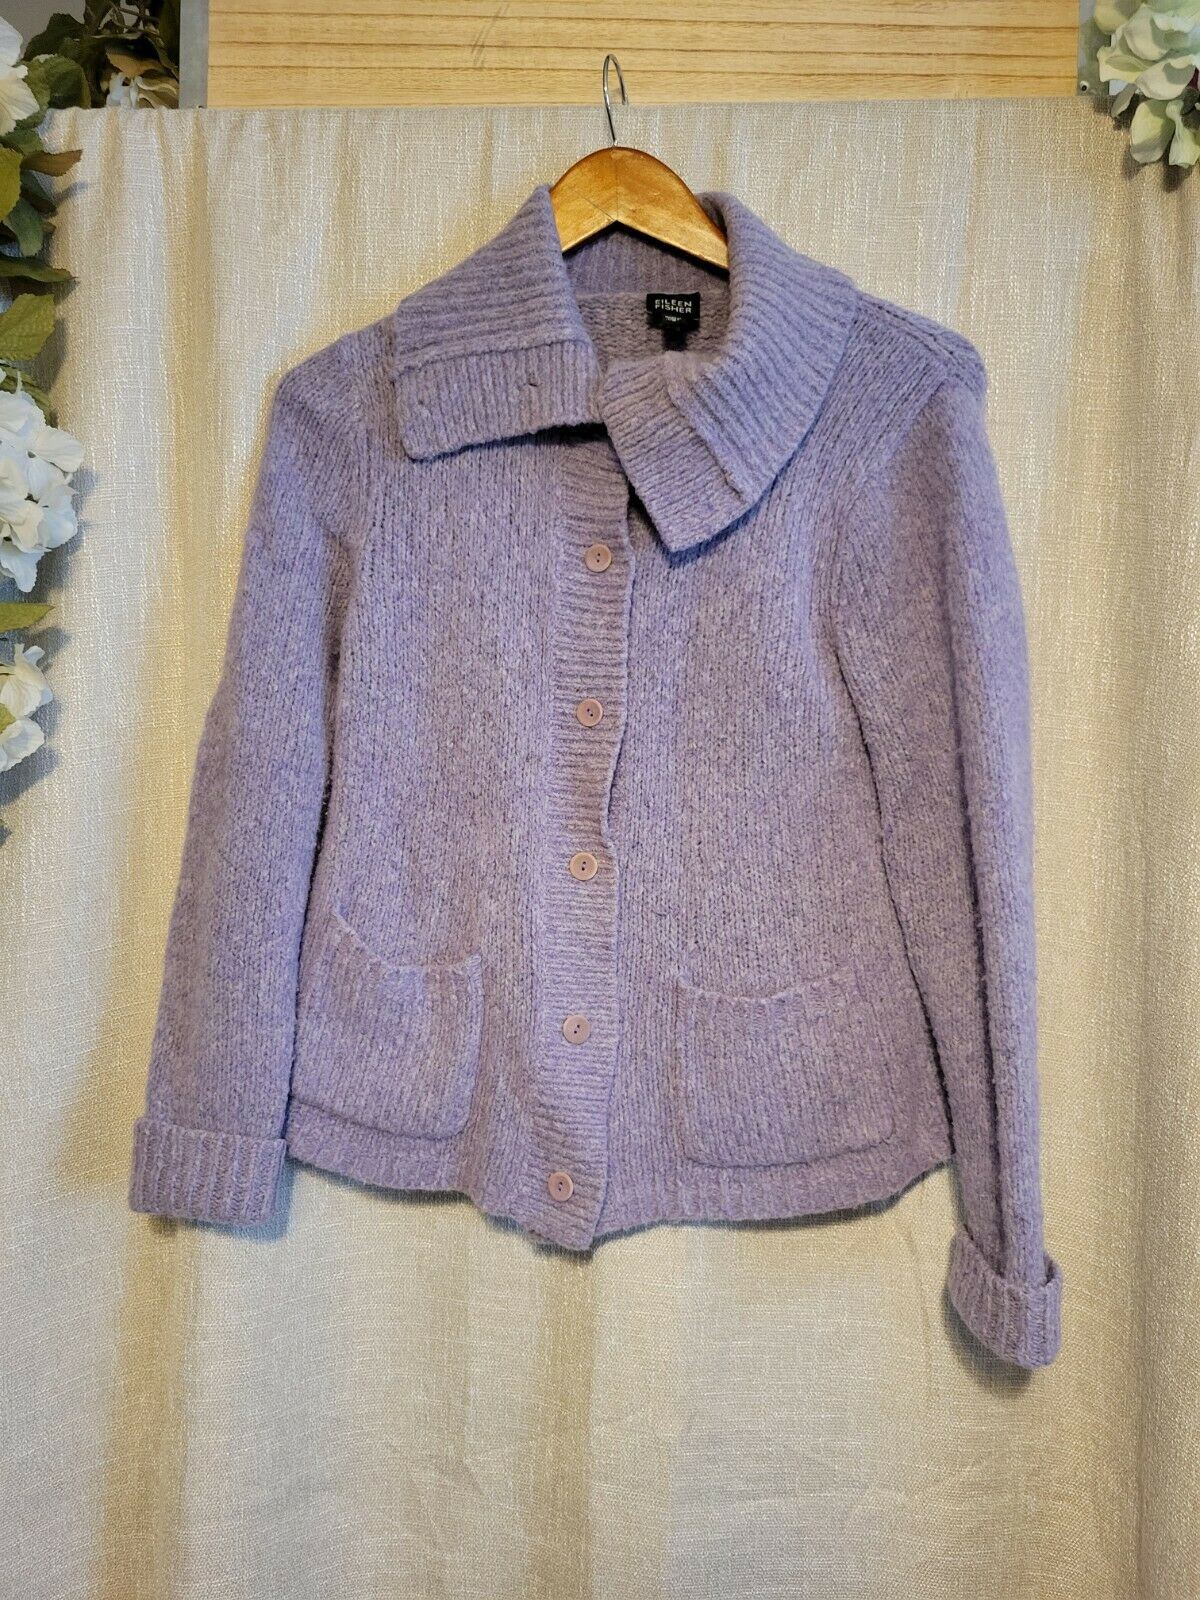 Eileen Fisher Lilac Purple Wool Cardigan Sweater … - image 1